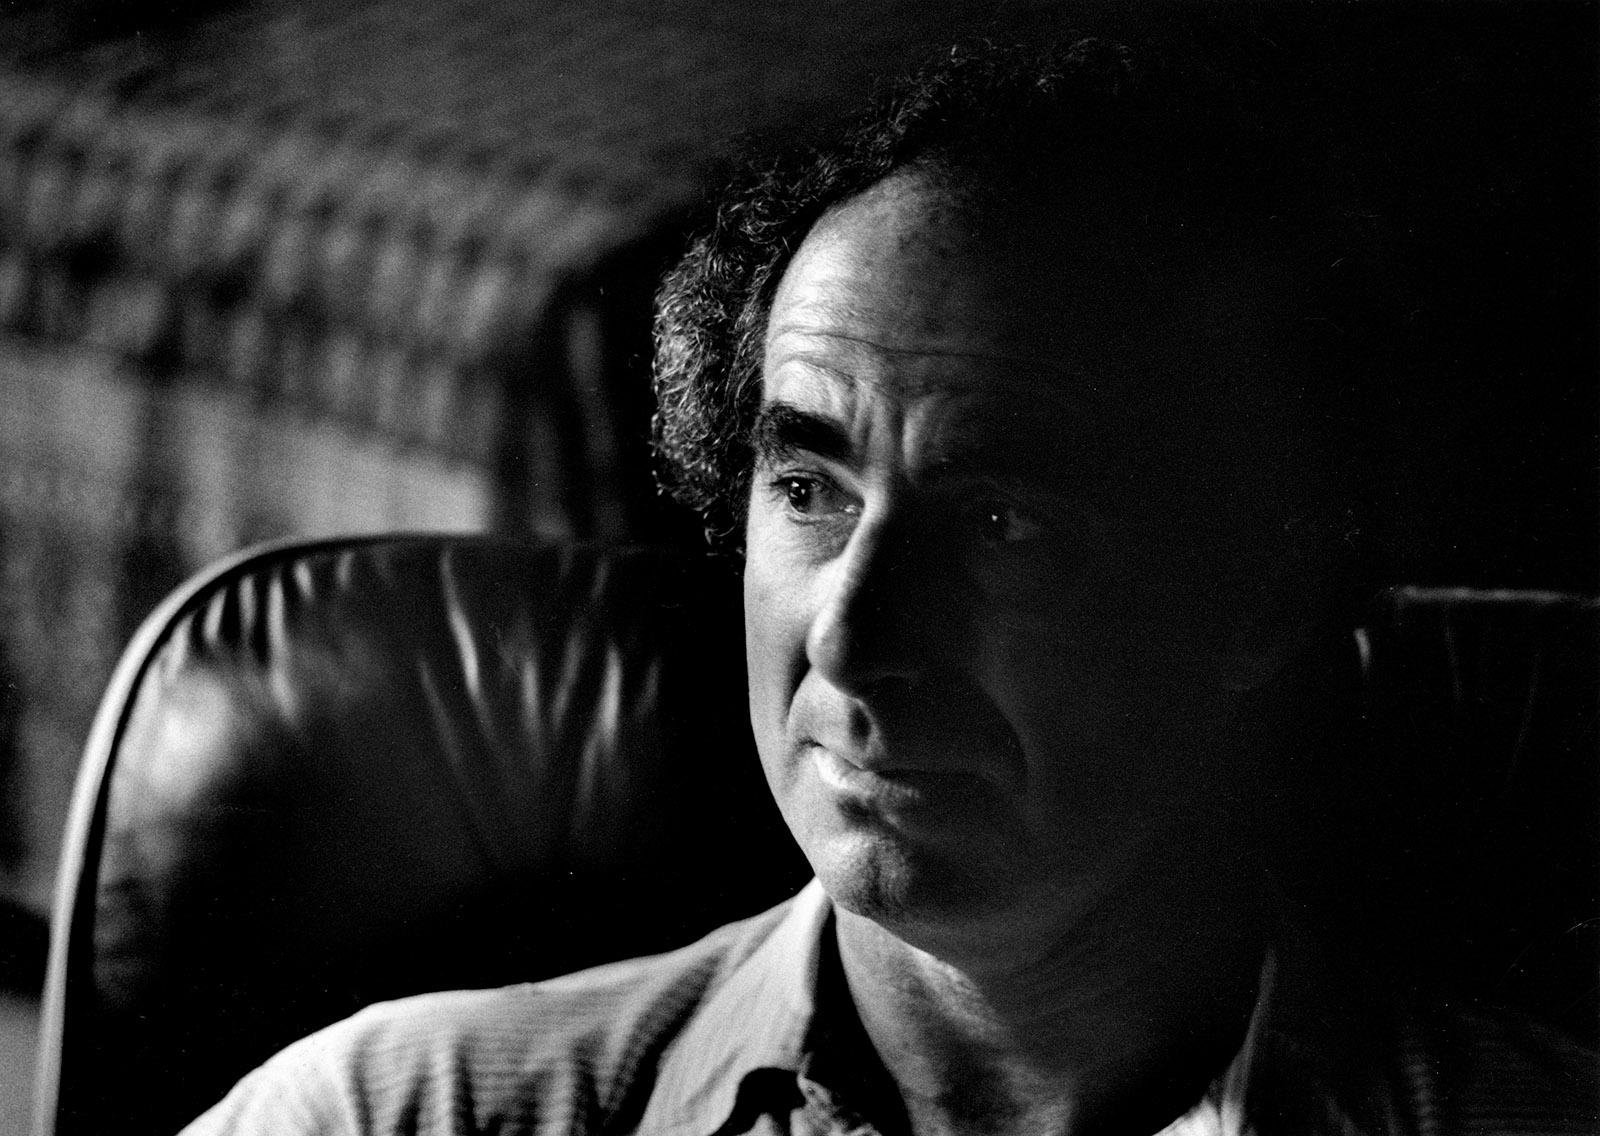 Philip Roth, Warren, Connecticut, 1979